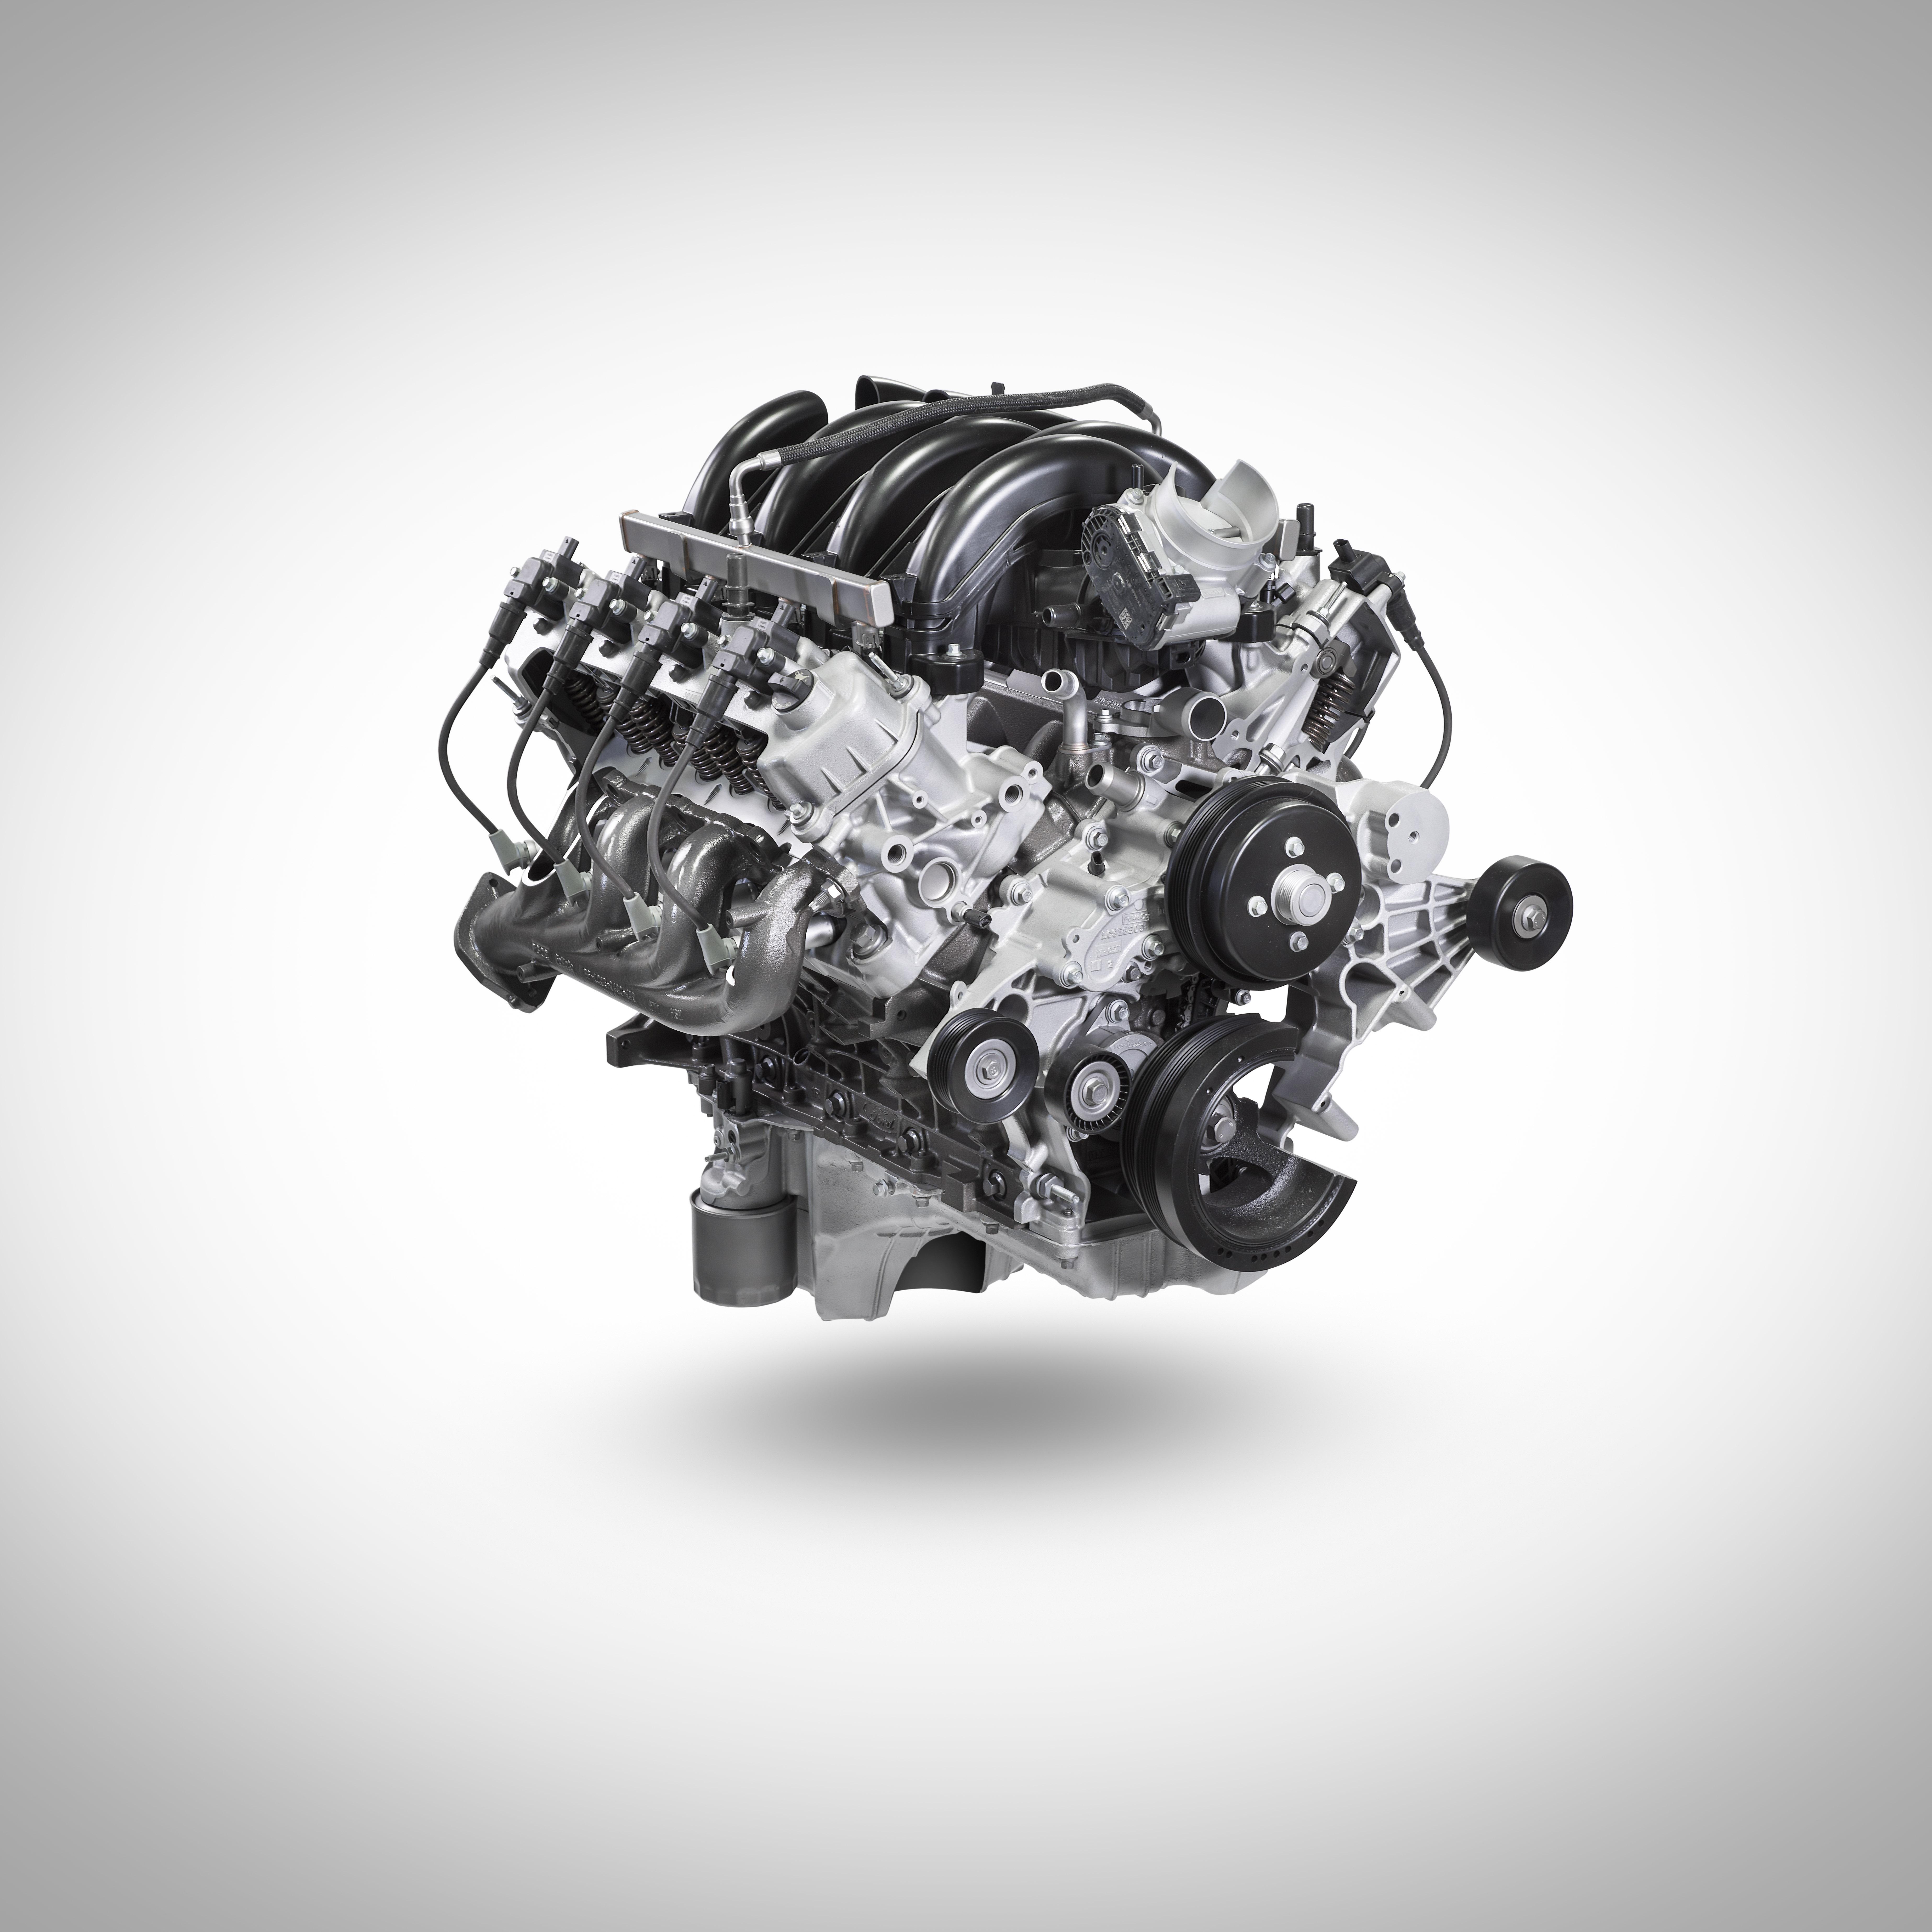 Ford's 7.3-liter pushrod V8 engine